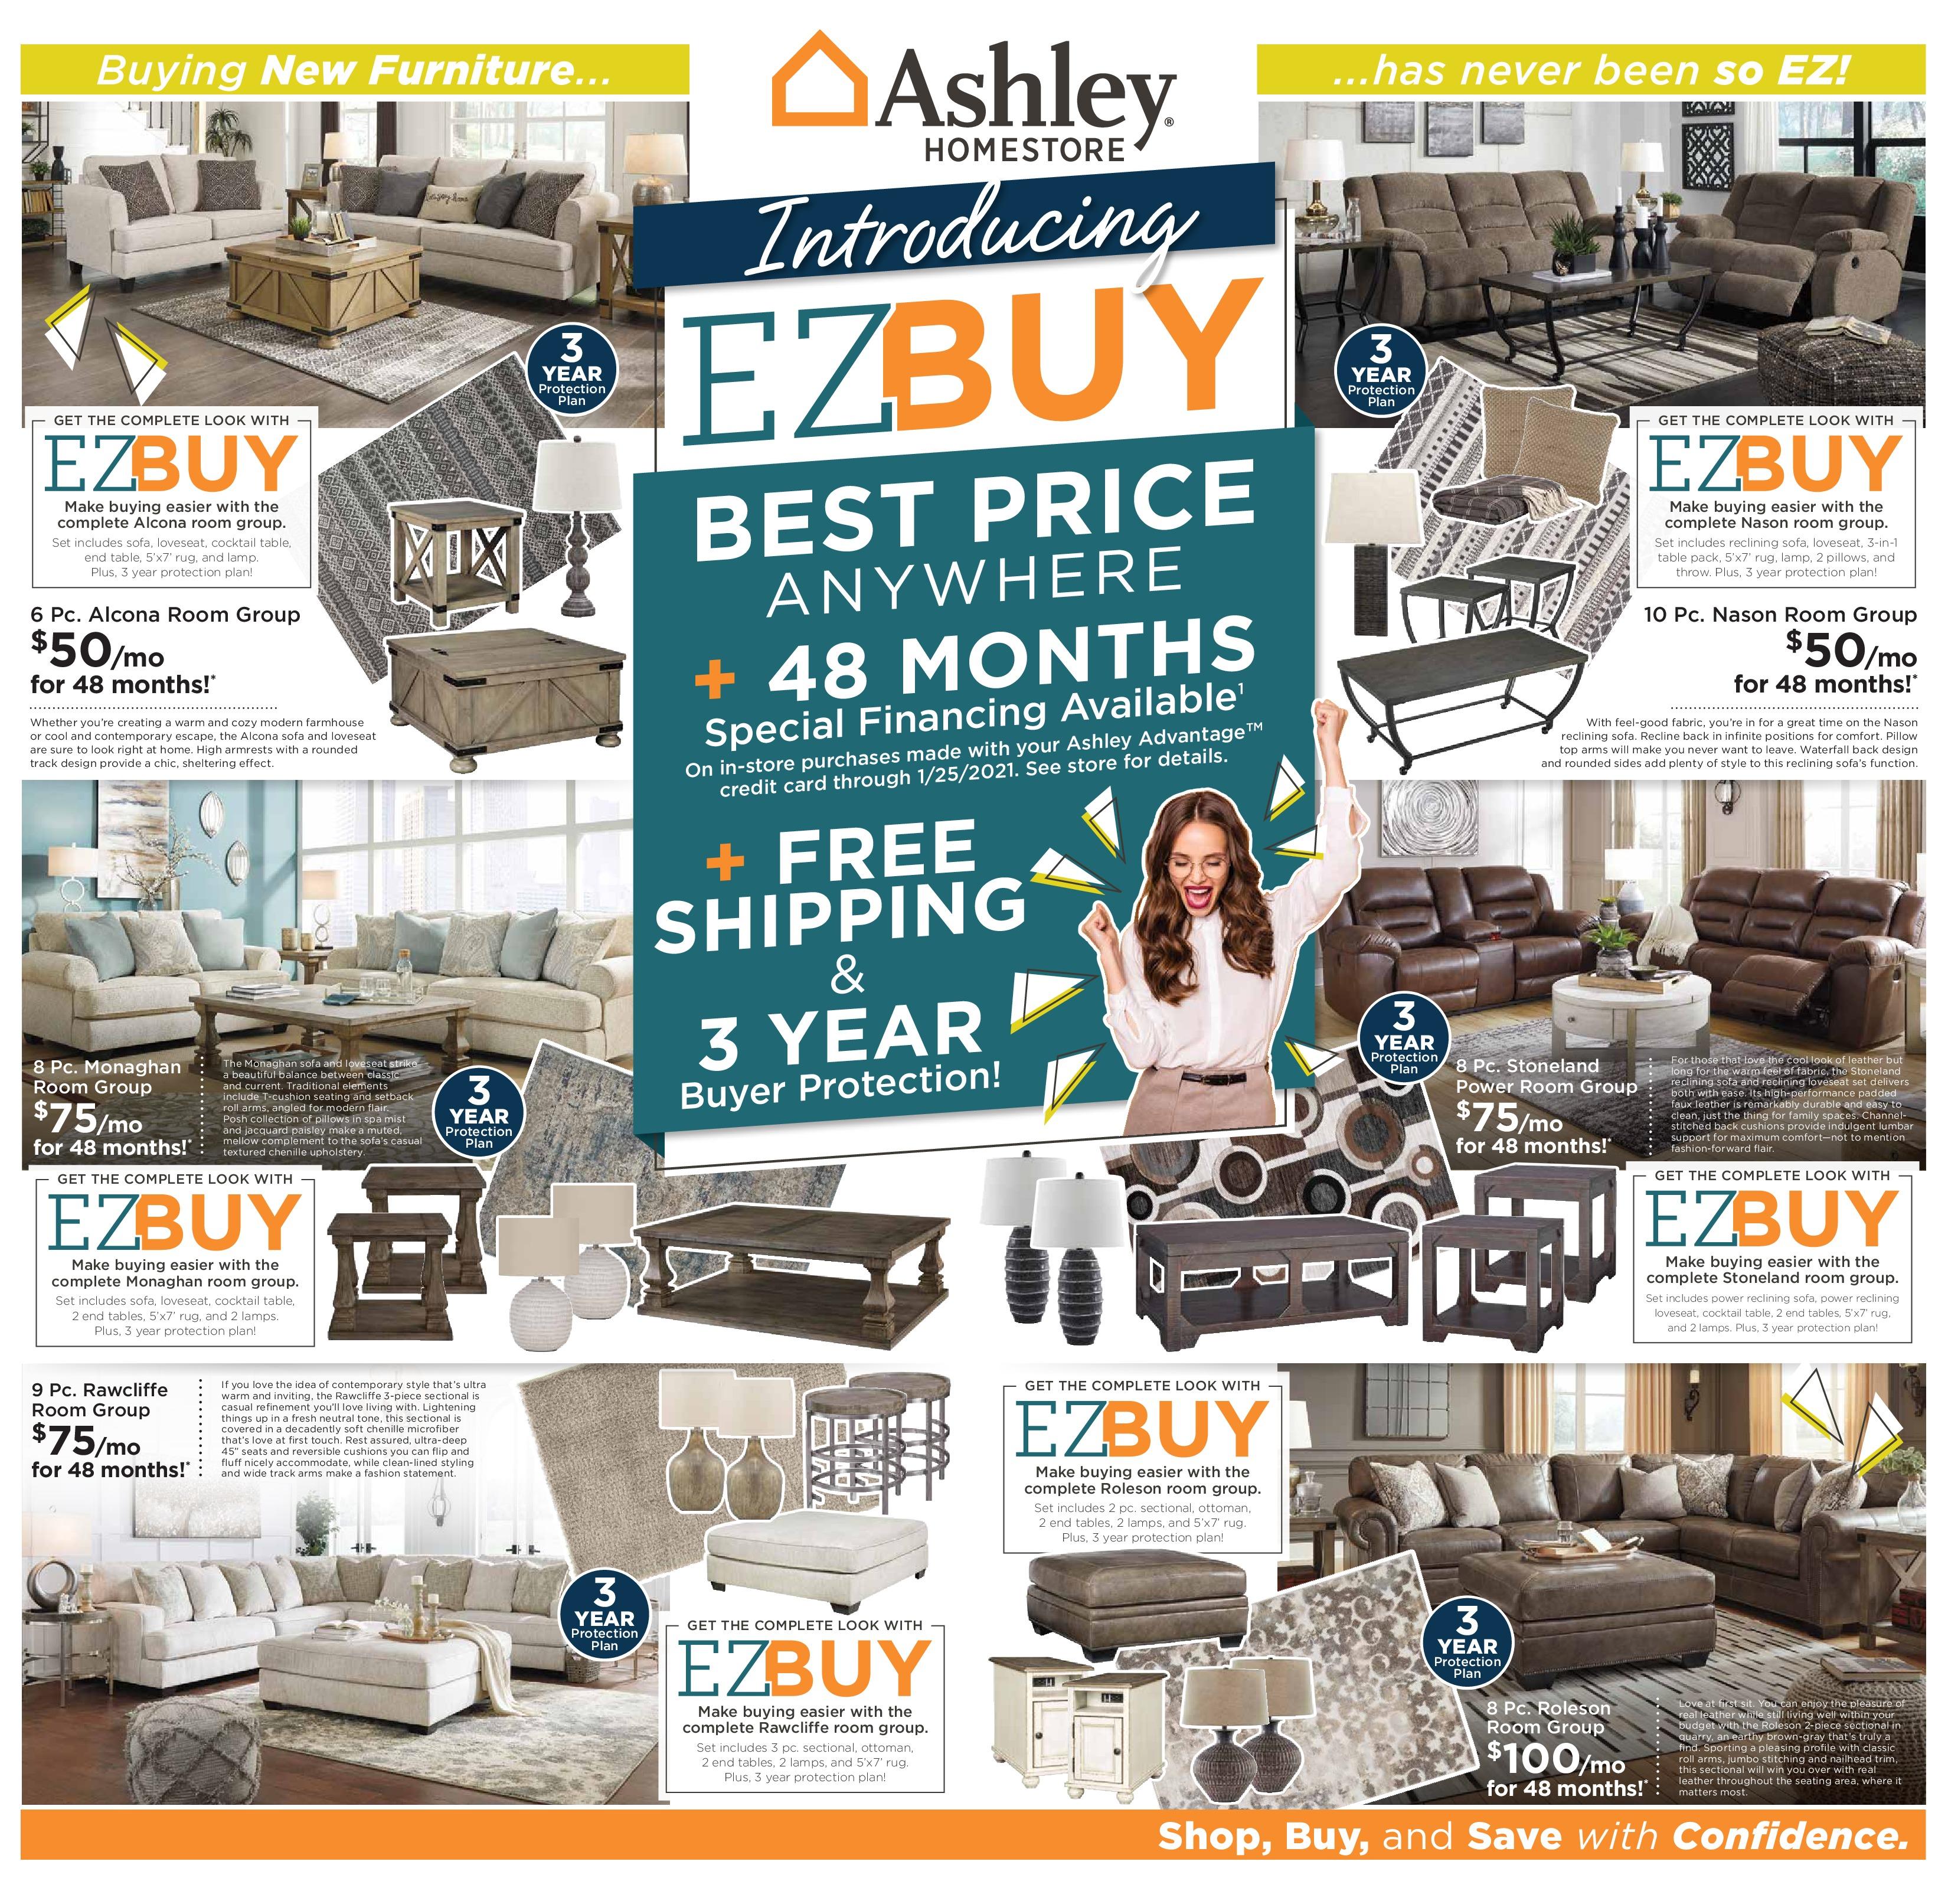 AHSOH-9021-2111-EasyBuys-WebSp